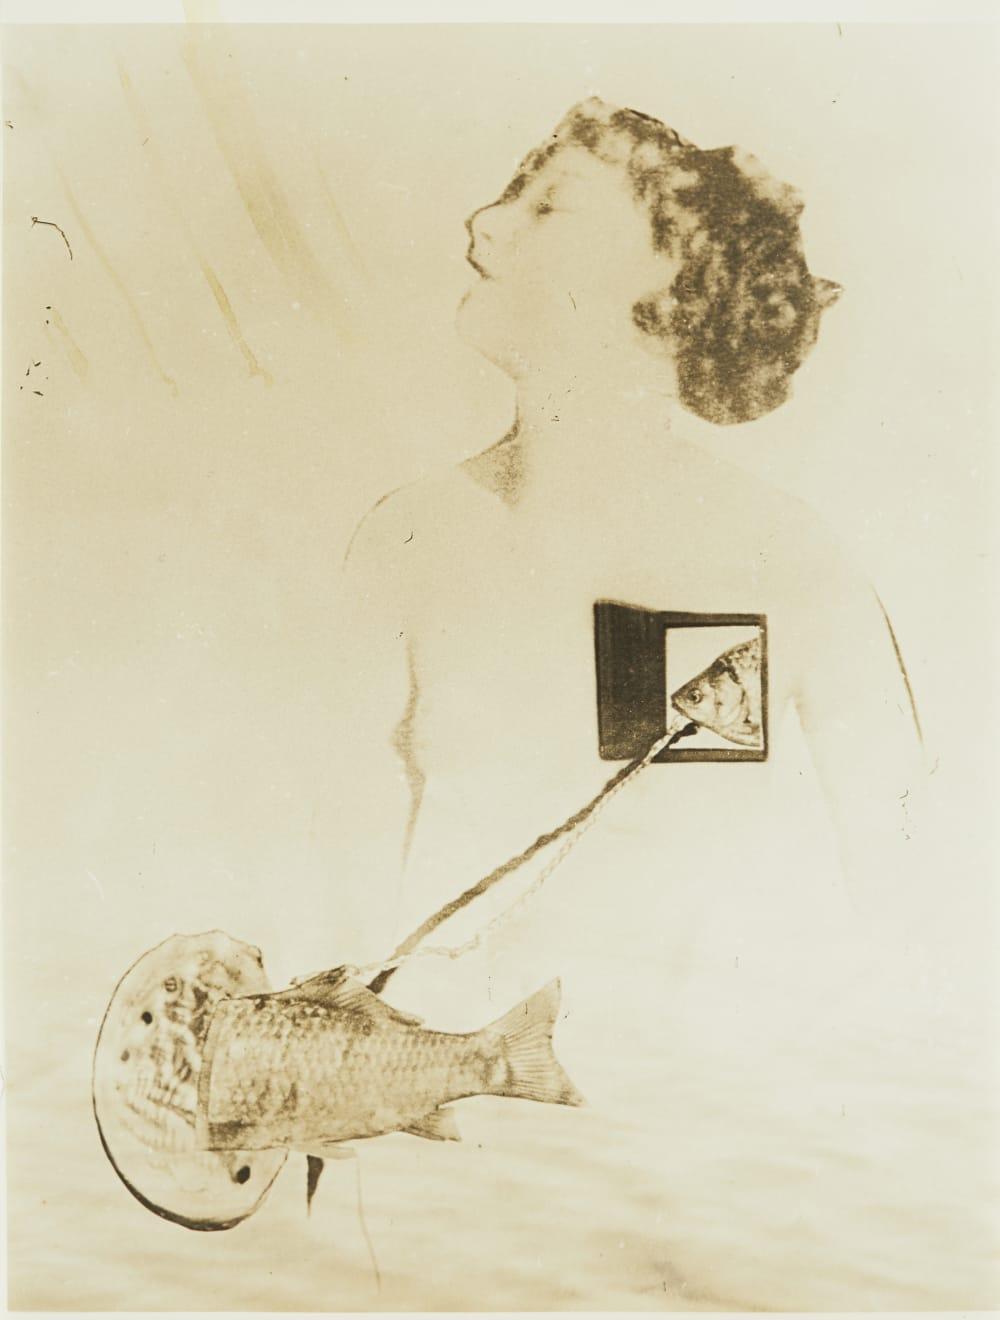 Kansuke Yamamoto, Heart in Motion - Shadow of Happiness, 1950